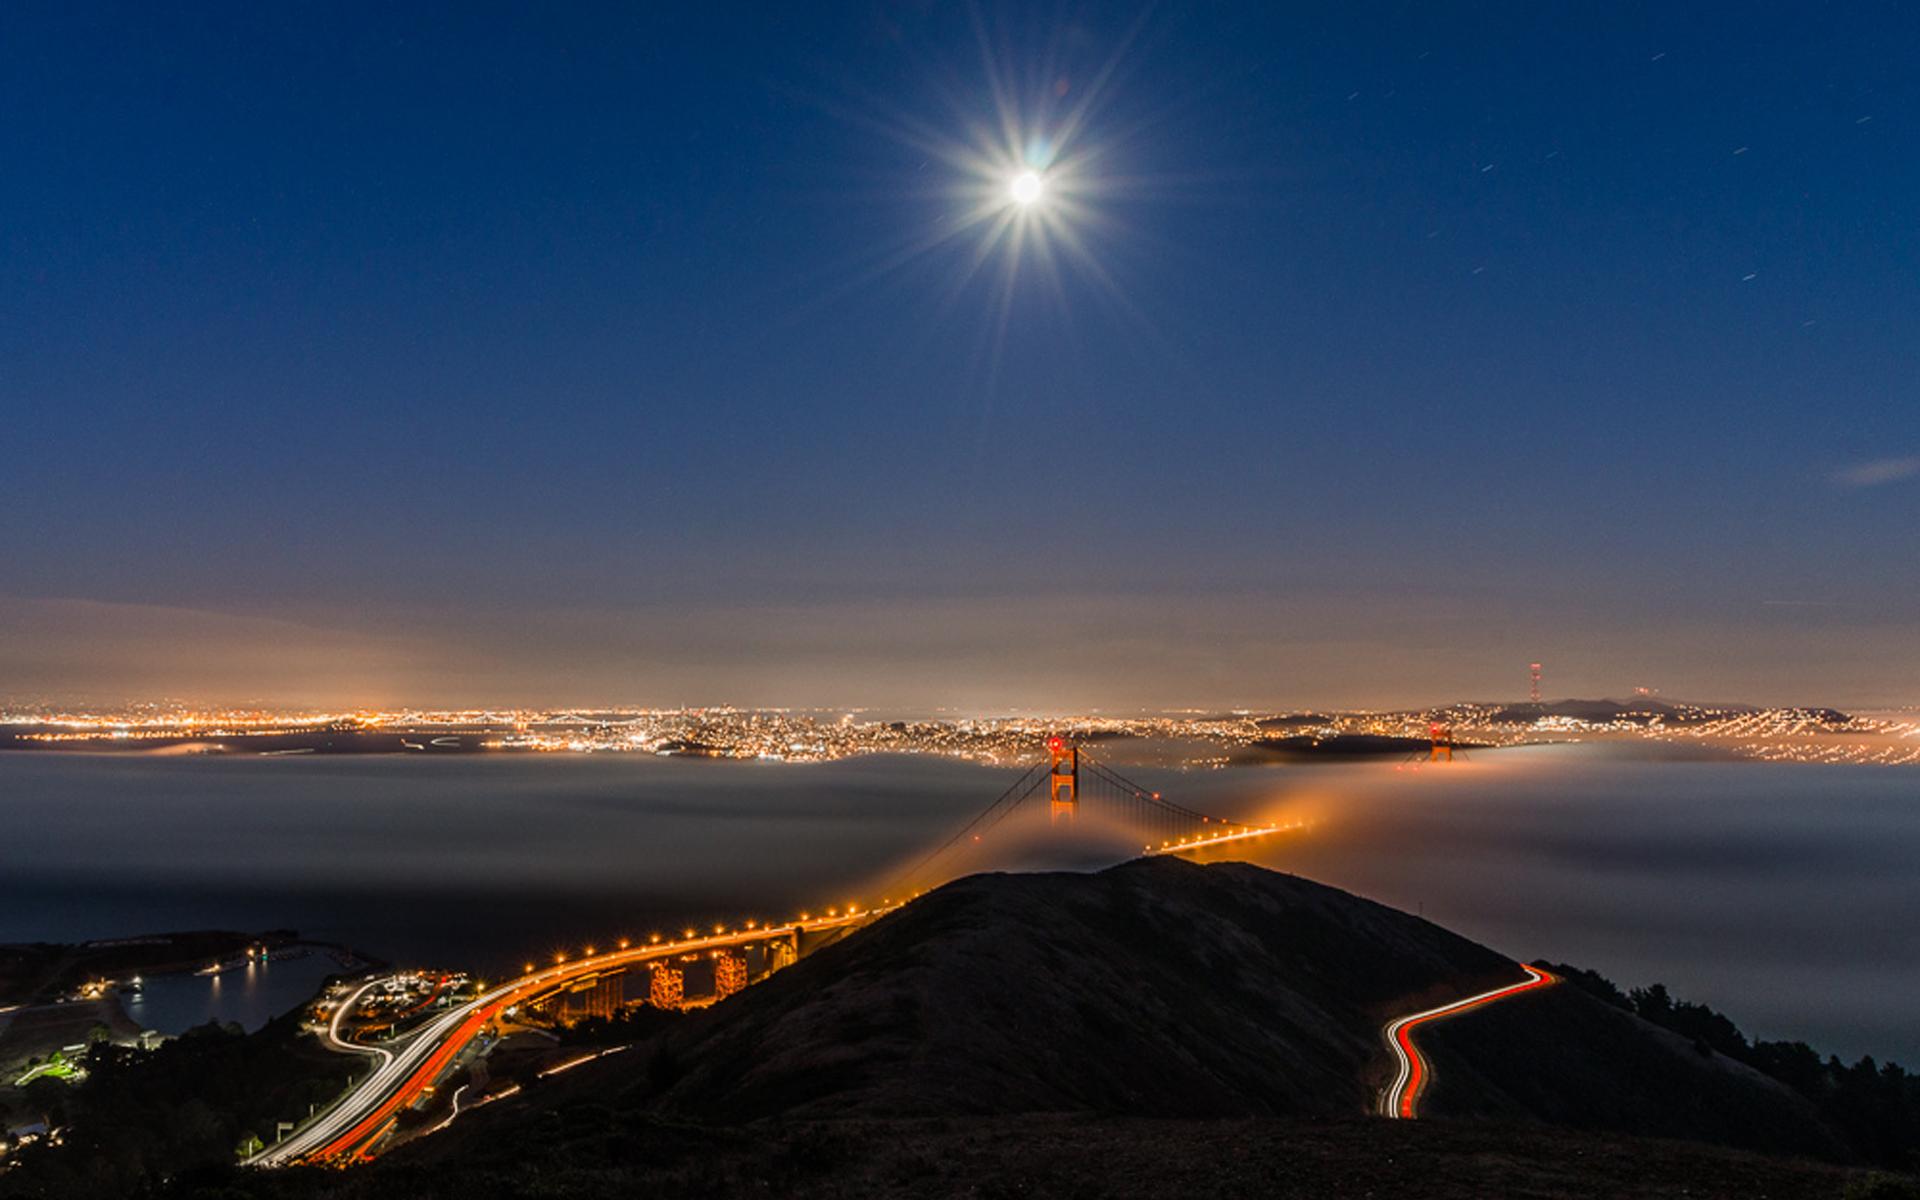 Must see Wallpaper Night Golden Gate Bridge - 453790  Best Photo Reference-42887.jpg